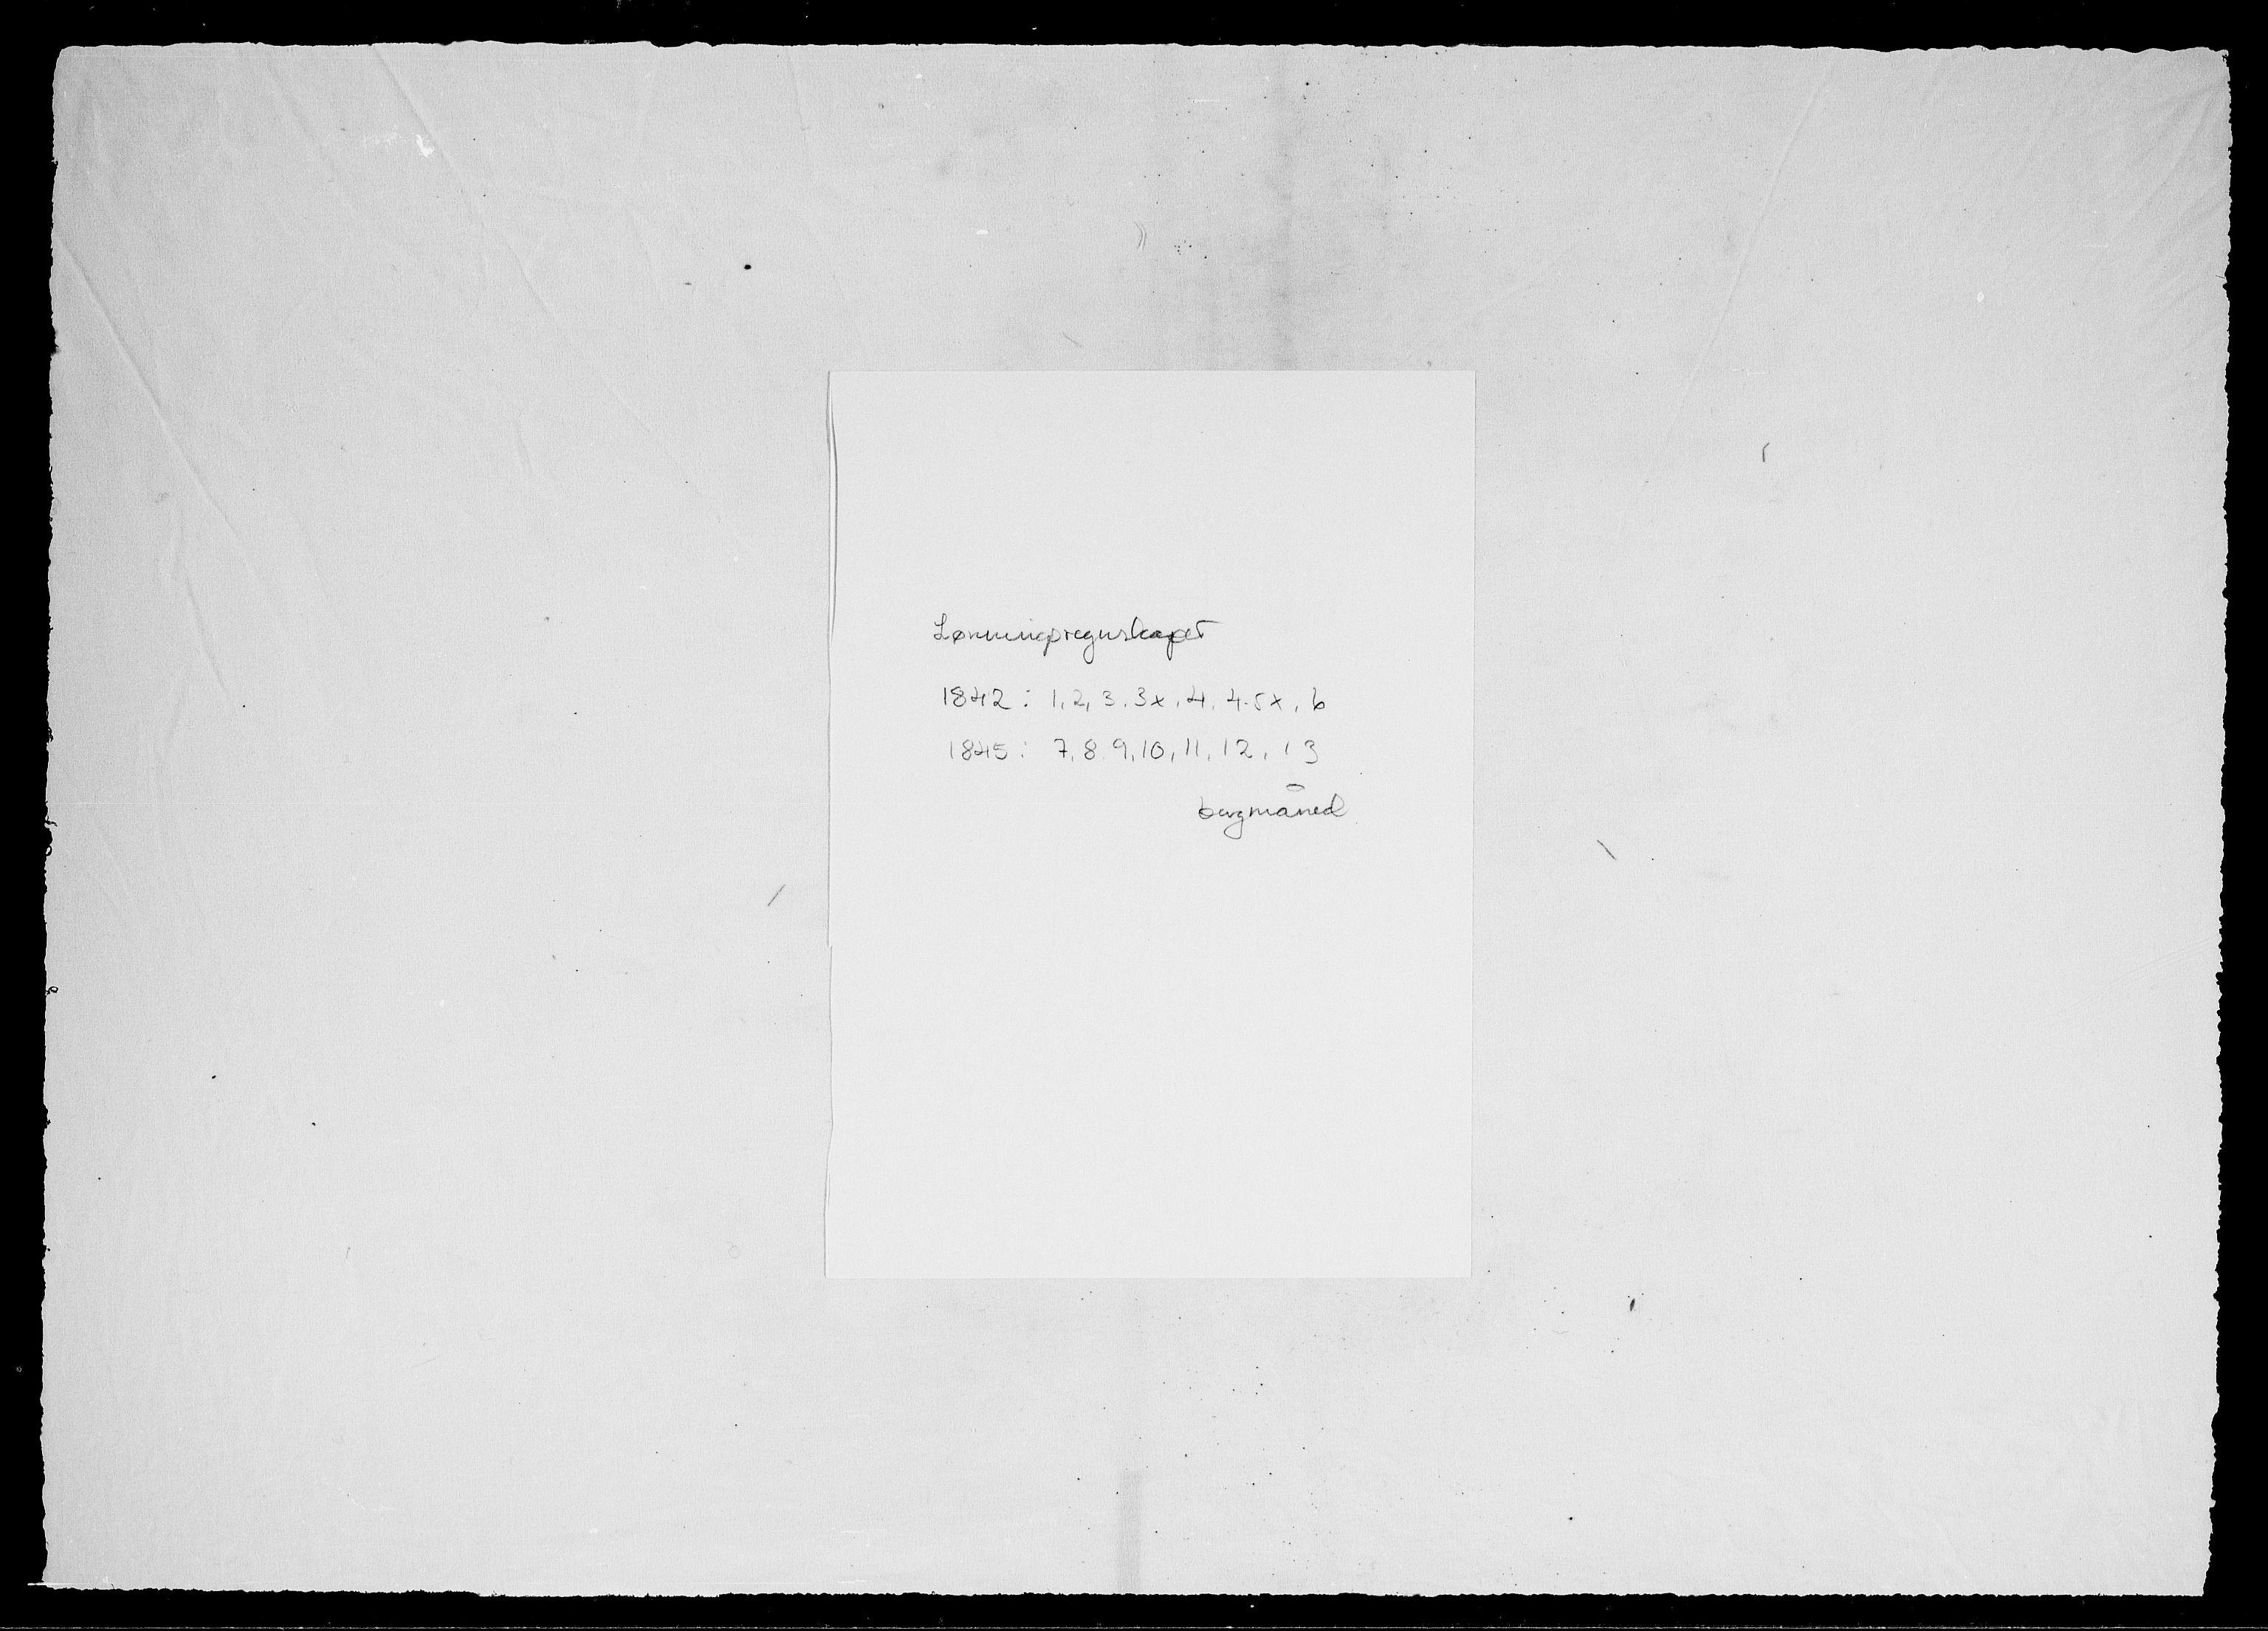 RA, Modums Blaafarveværk, G/Gd/Gdd/L0281, 1842-1845, s. 2